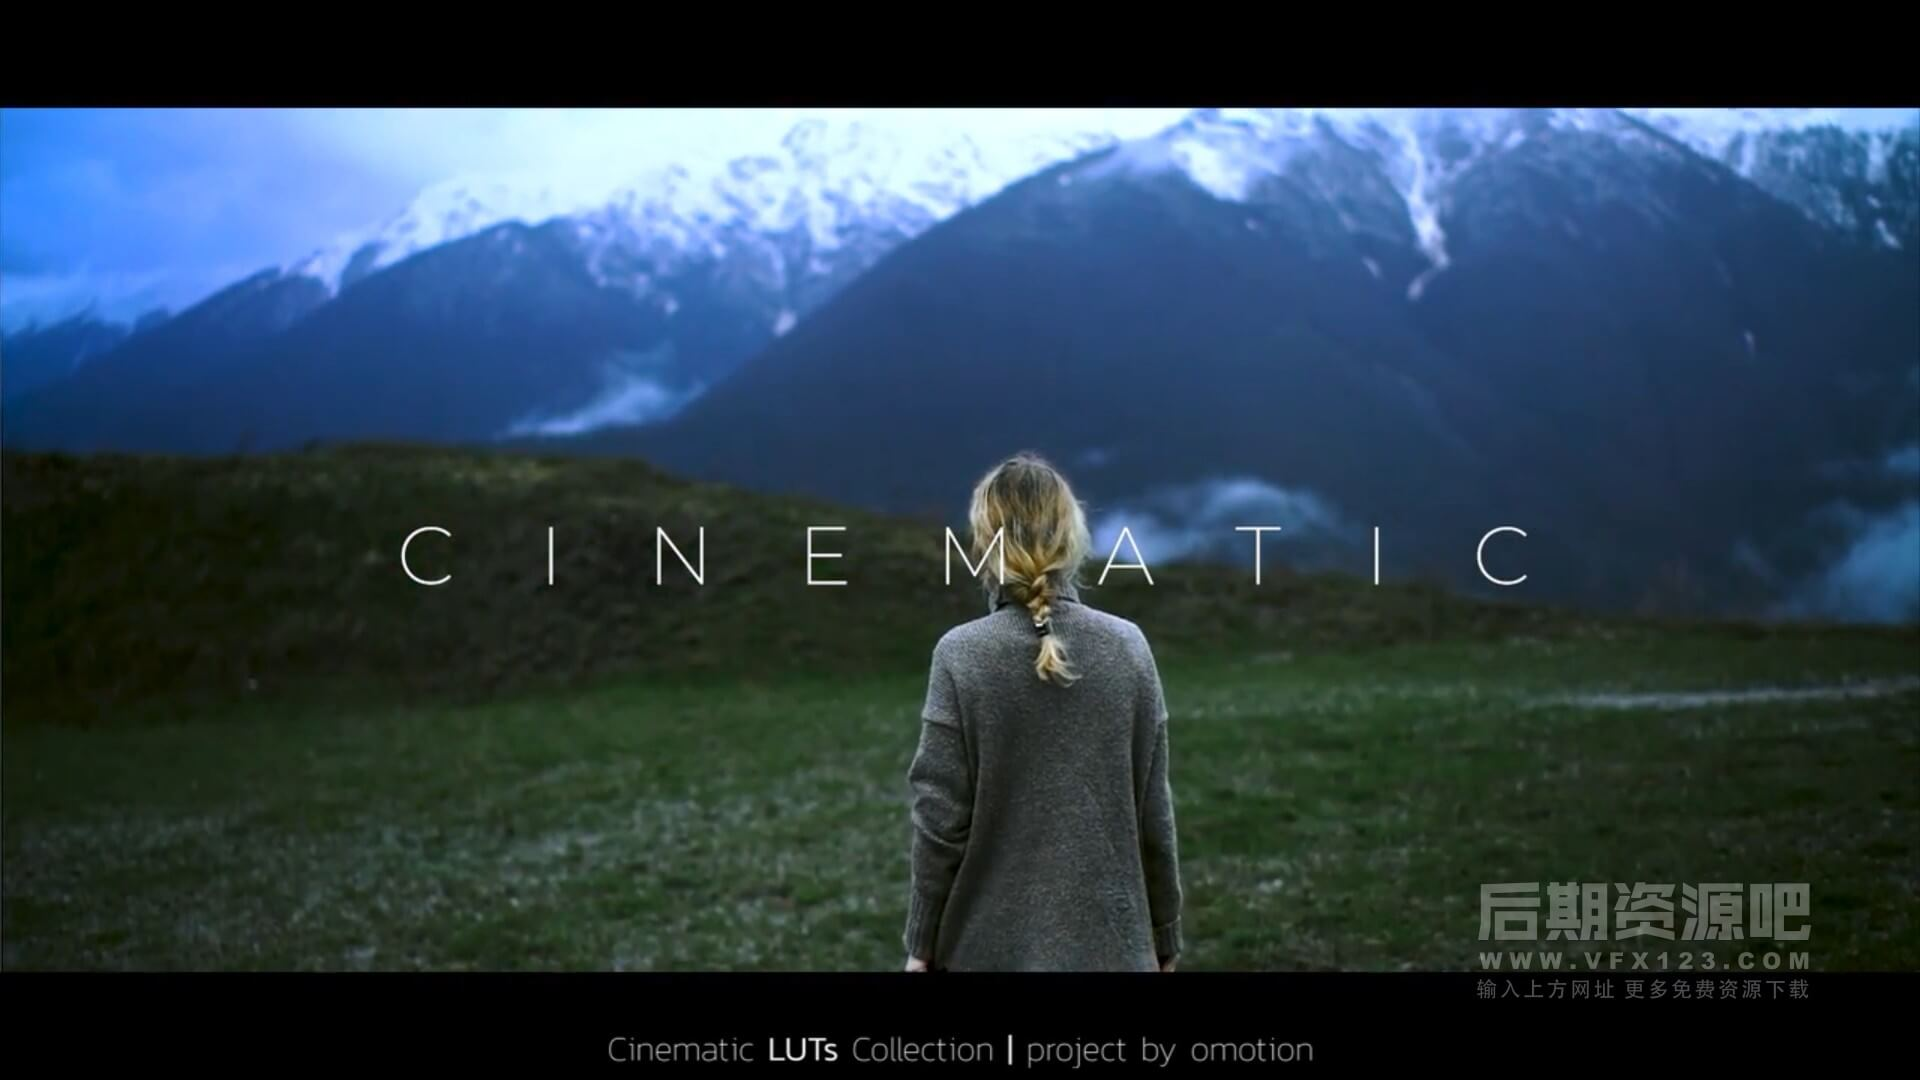 LUTs预设 50组电影预告片户外冒险旅行影片制作调色预设 Cinematic LUTs